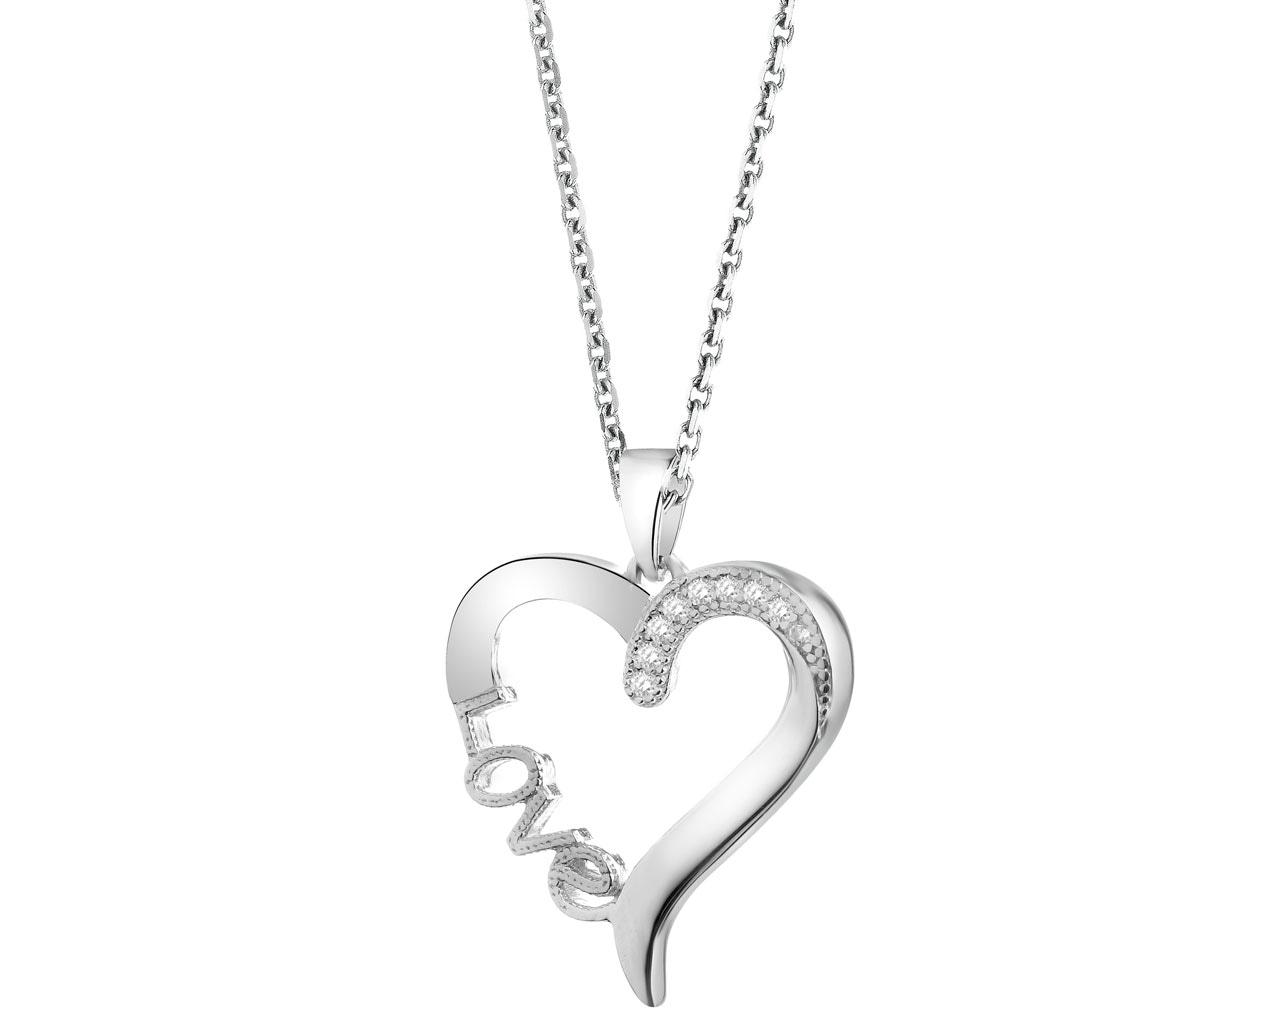 54a62e3f21d324 Zawieszka srebrna z cyrkoniami - serce - wzór AP522-6228 / Apart